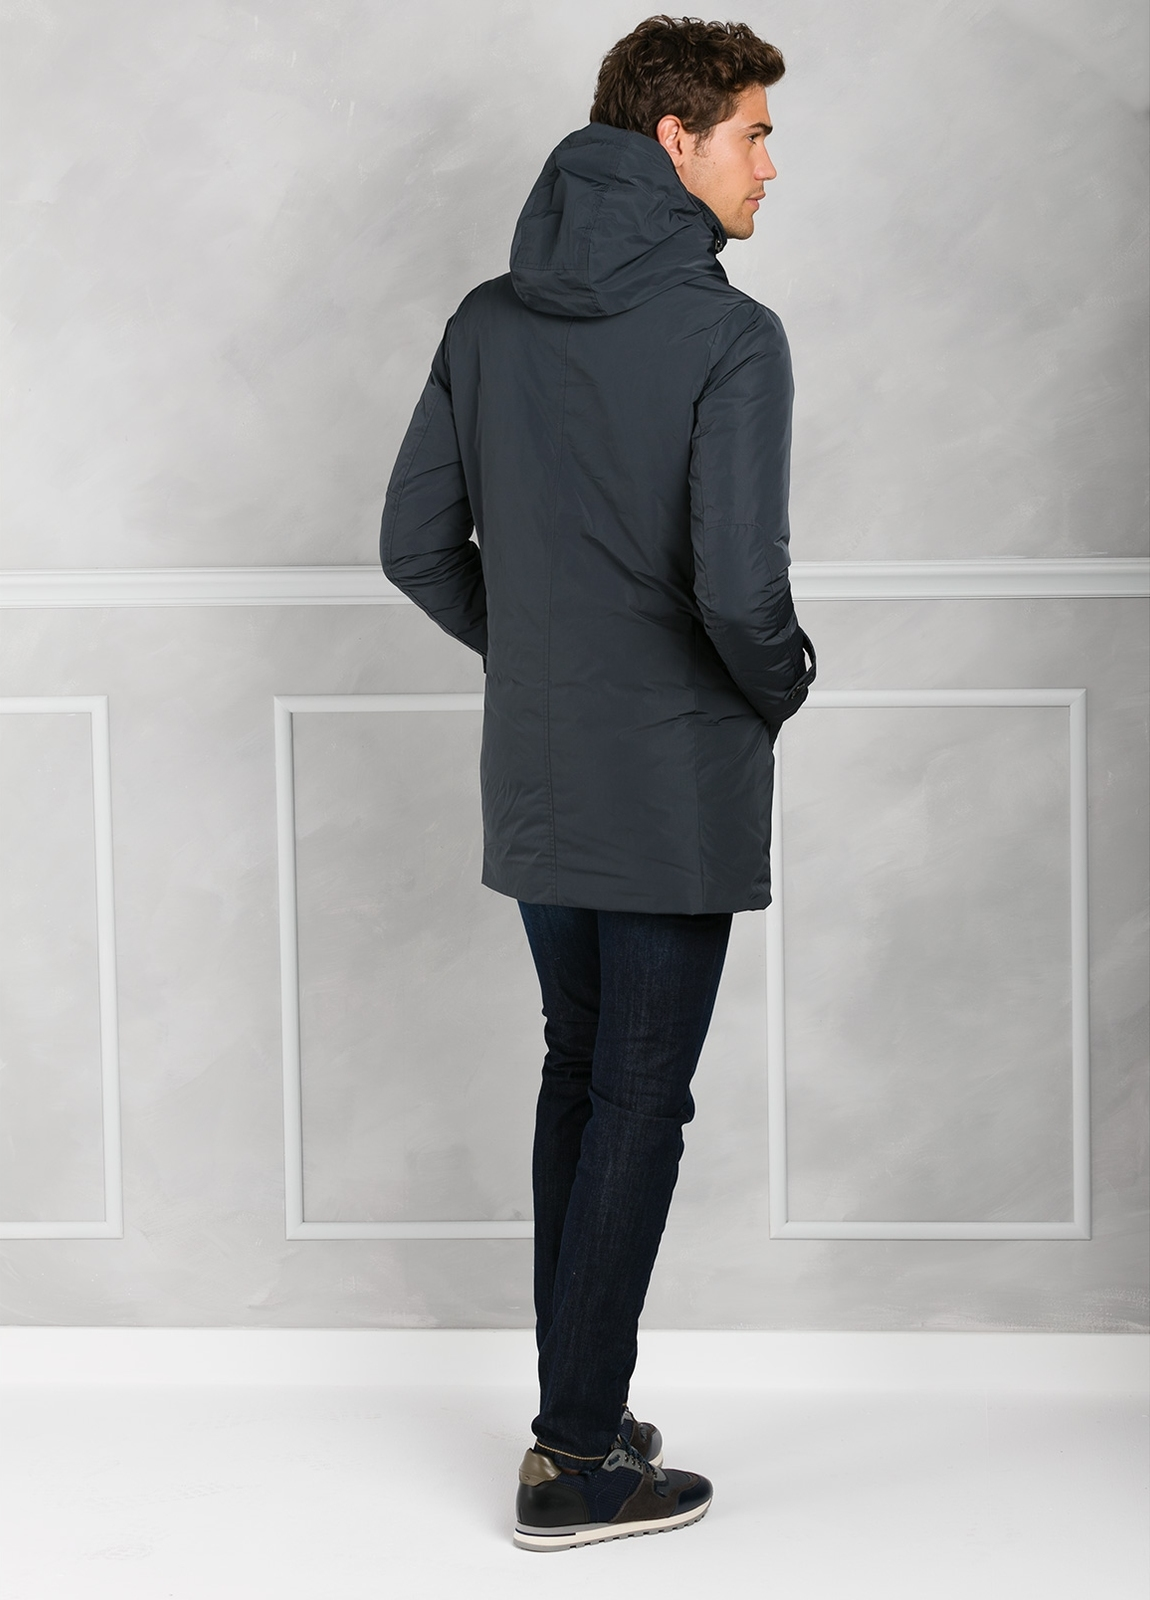 Chaqueta larga con capucha modelo NYLON-LUX color gris. Tejido técnico. - Ítem2